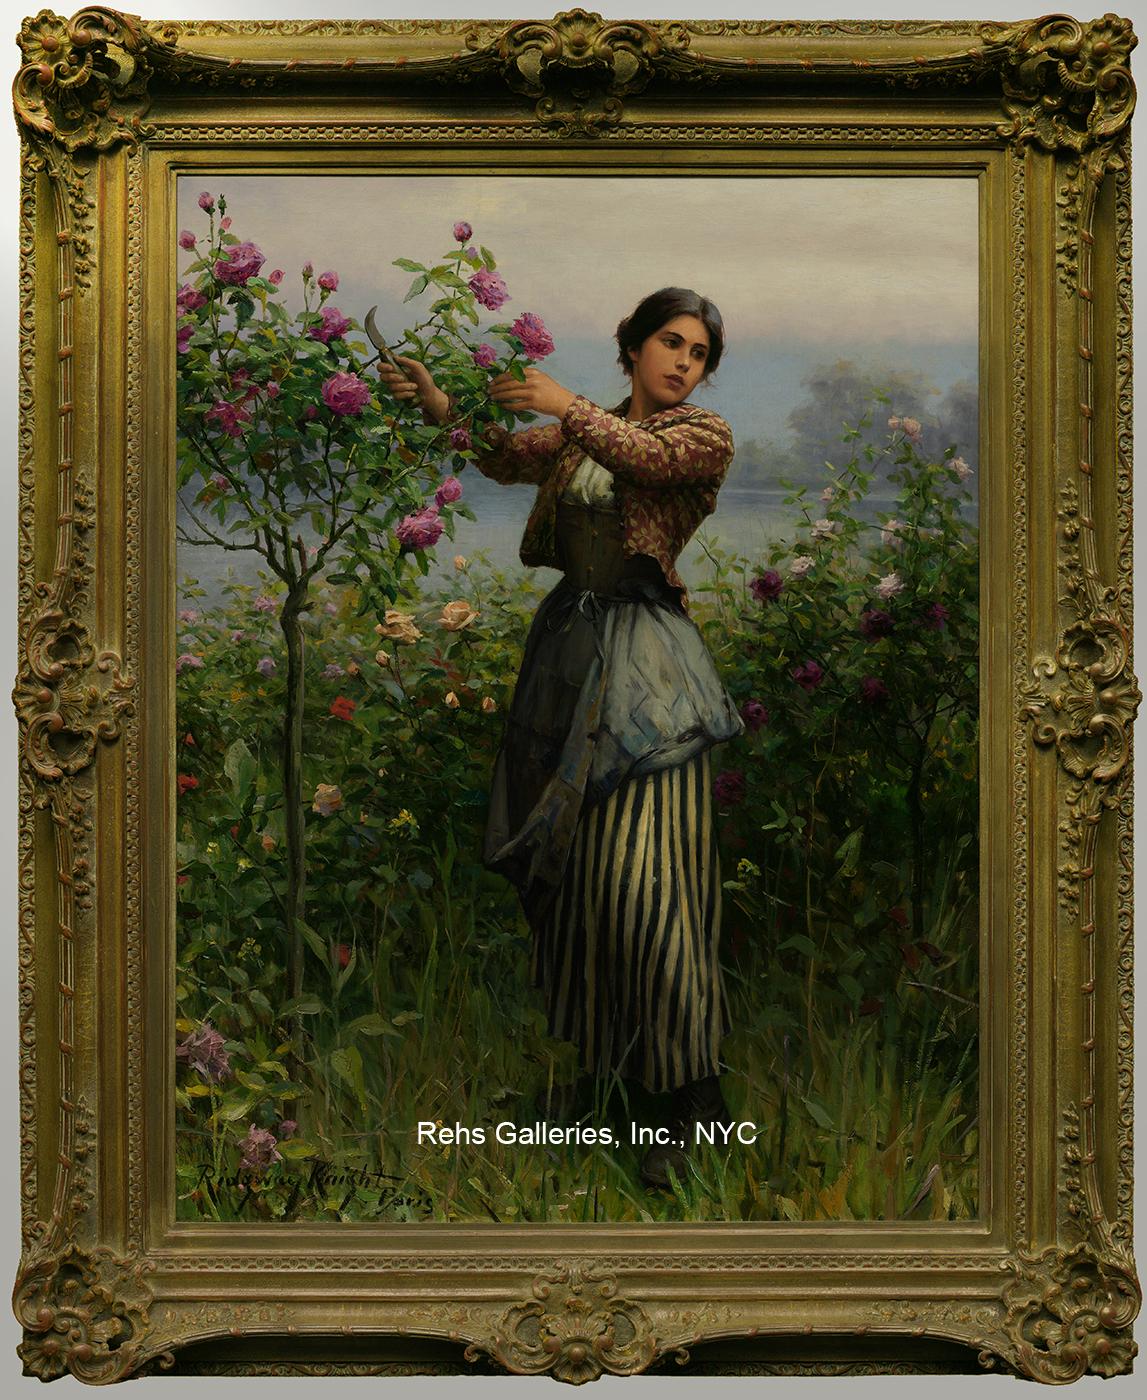 daniel_ridgway_knight_e1286_cutting_roses_framed.jpg